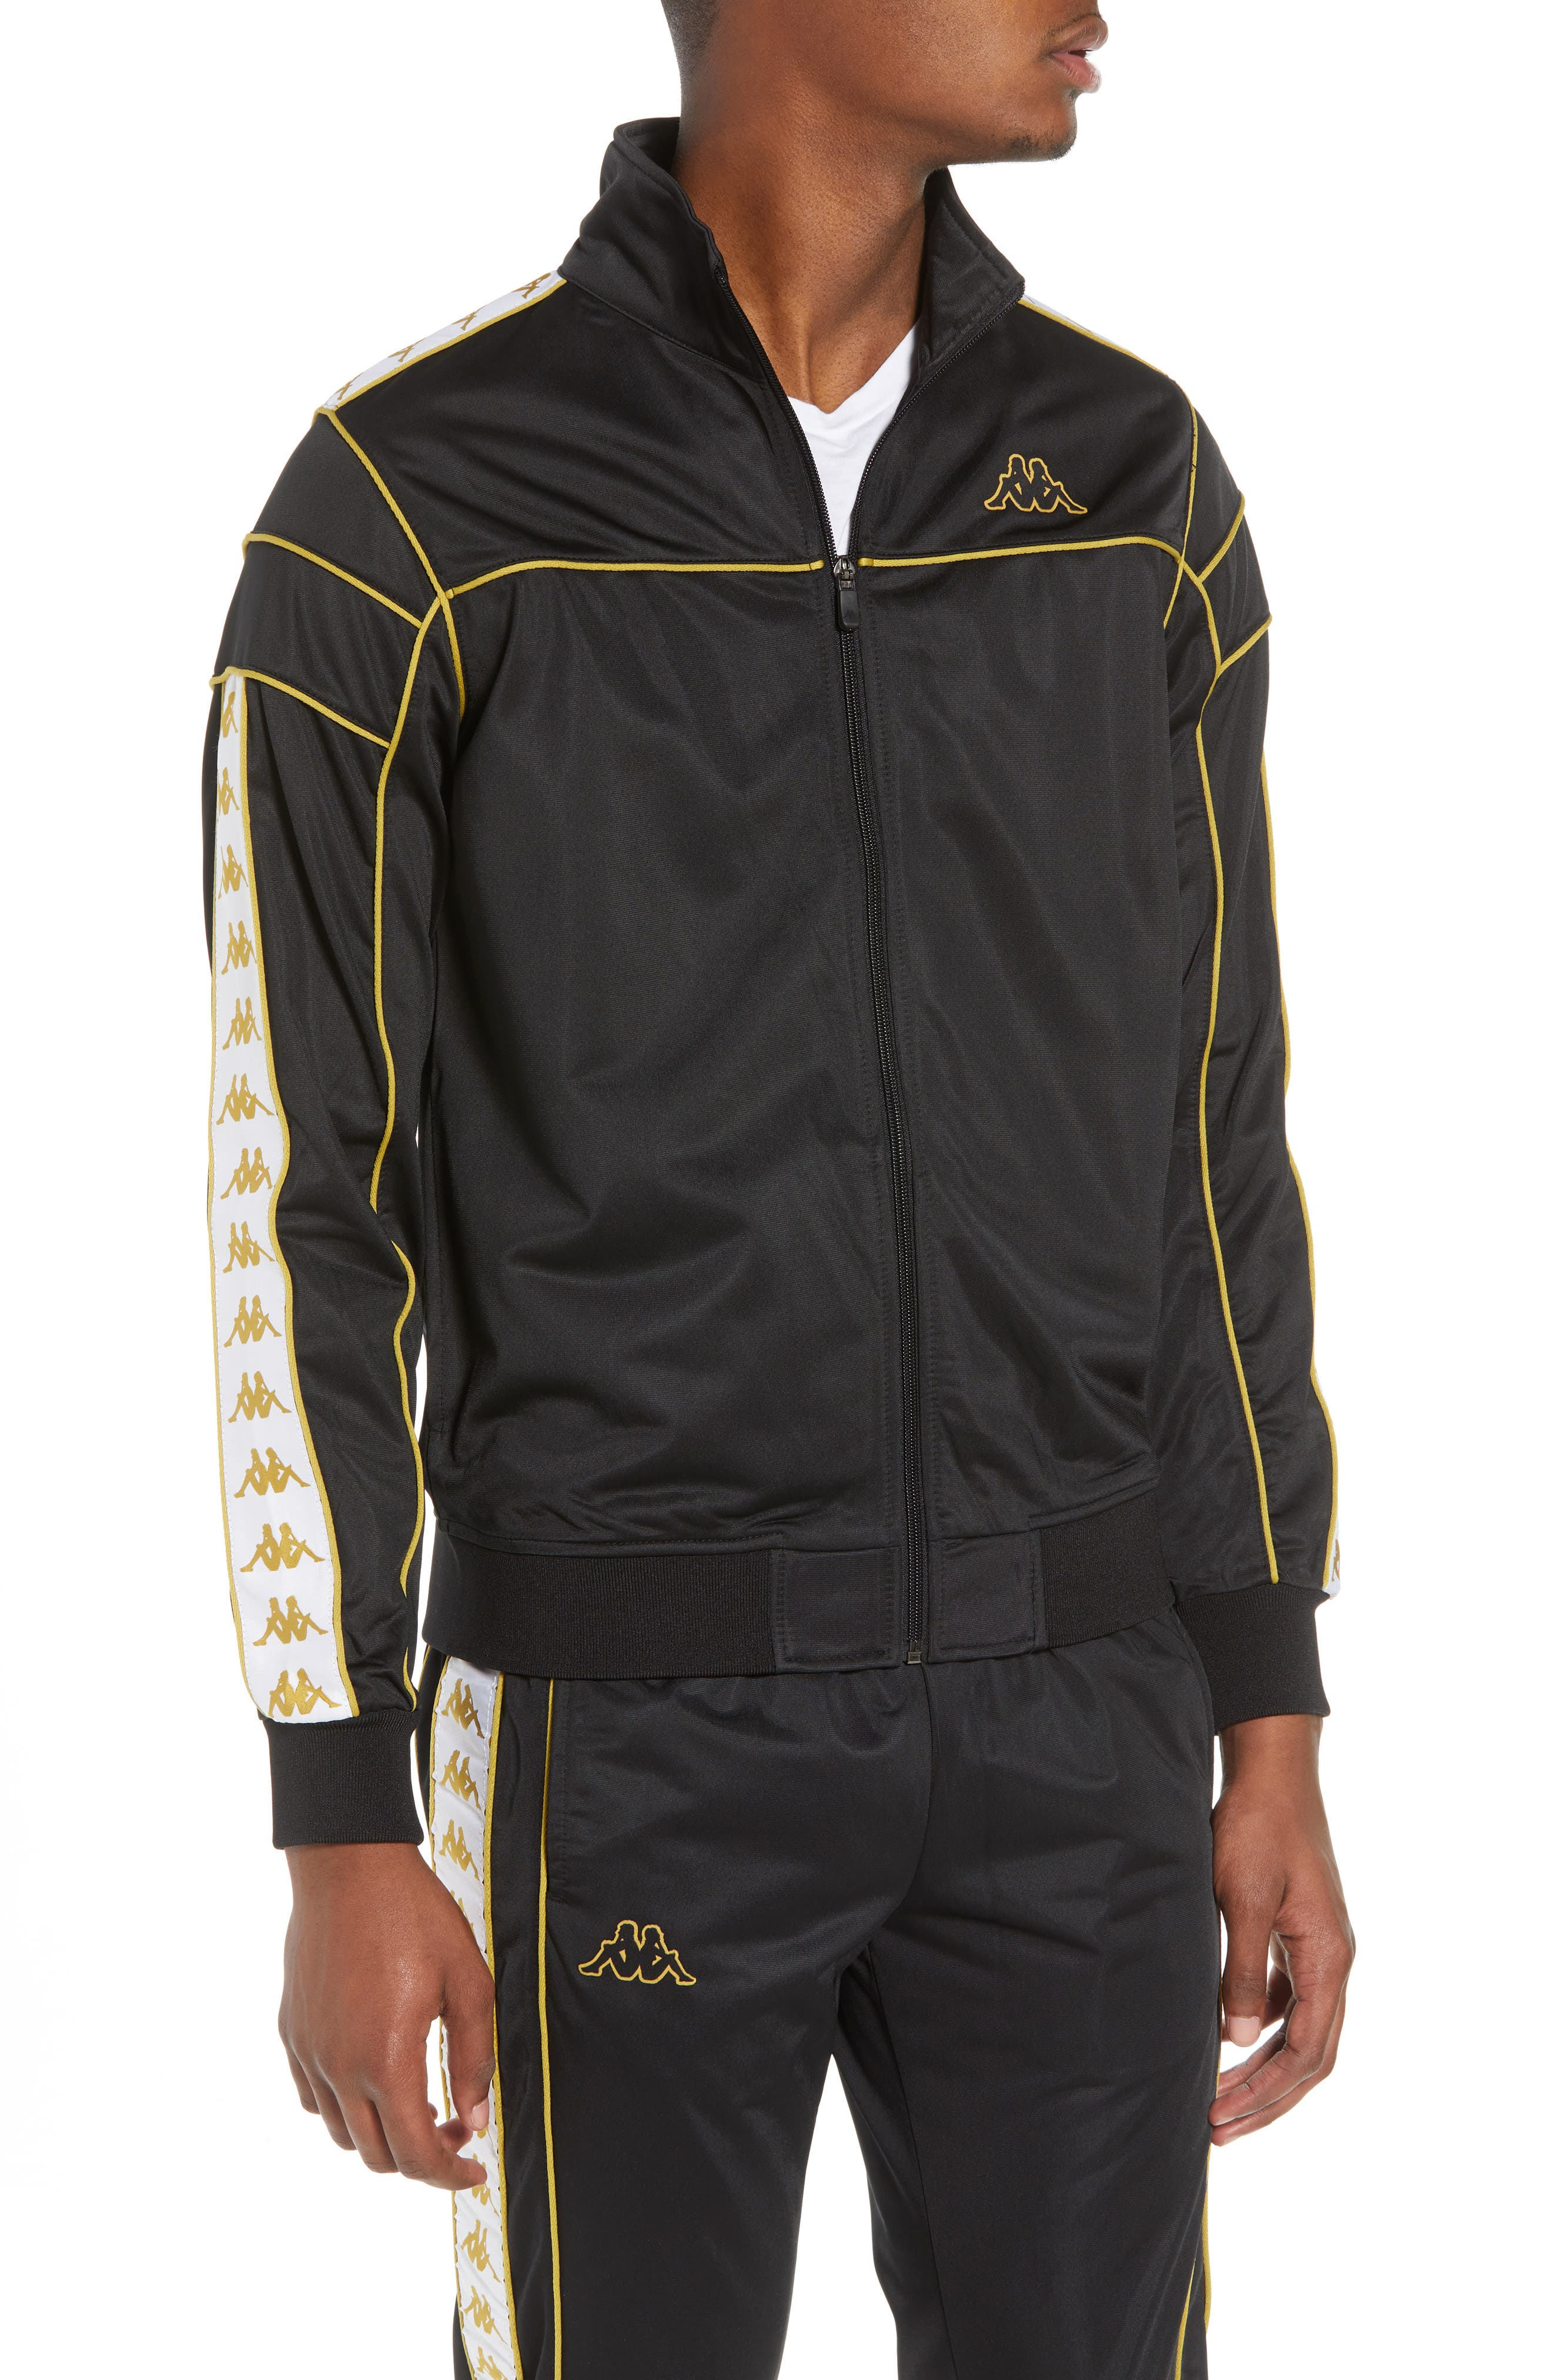 Kappa Racing Track Jacket